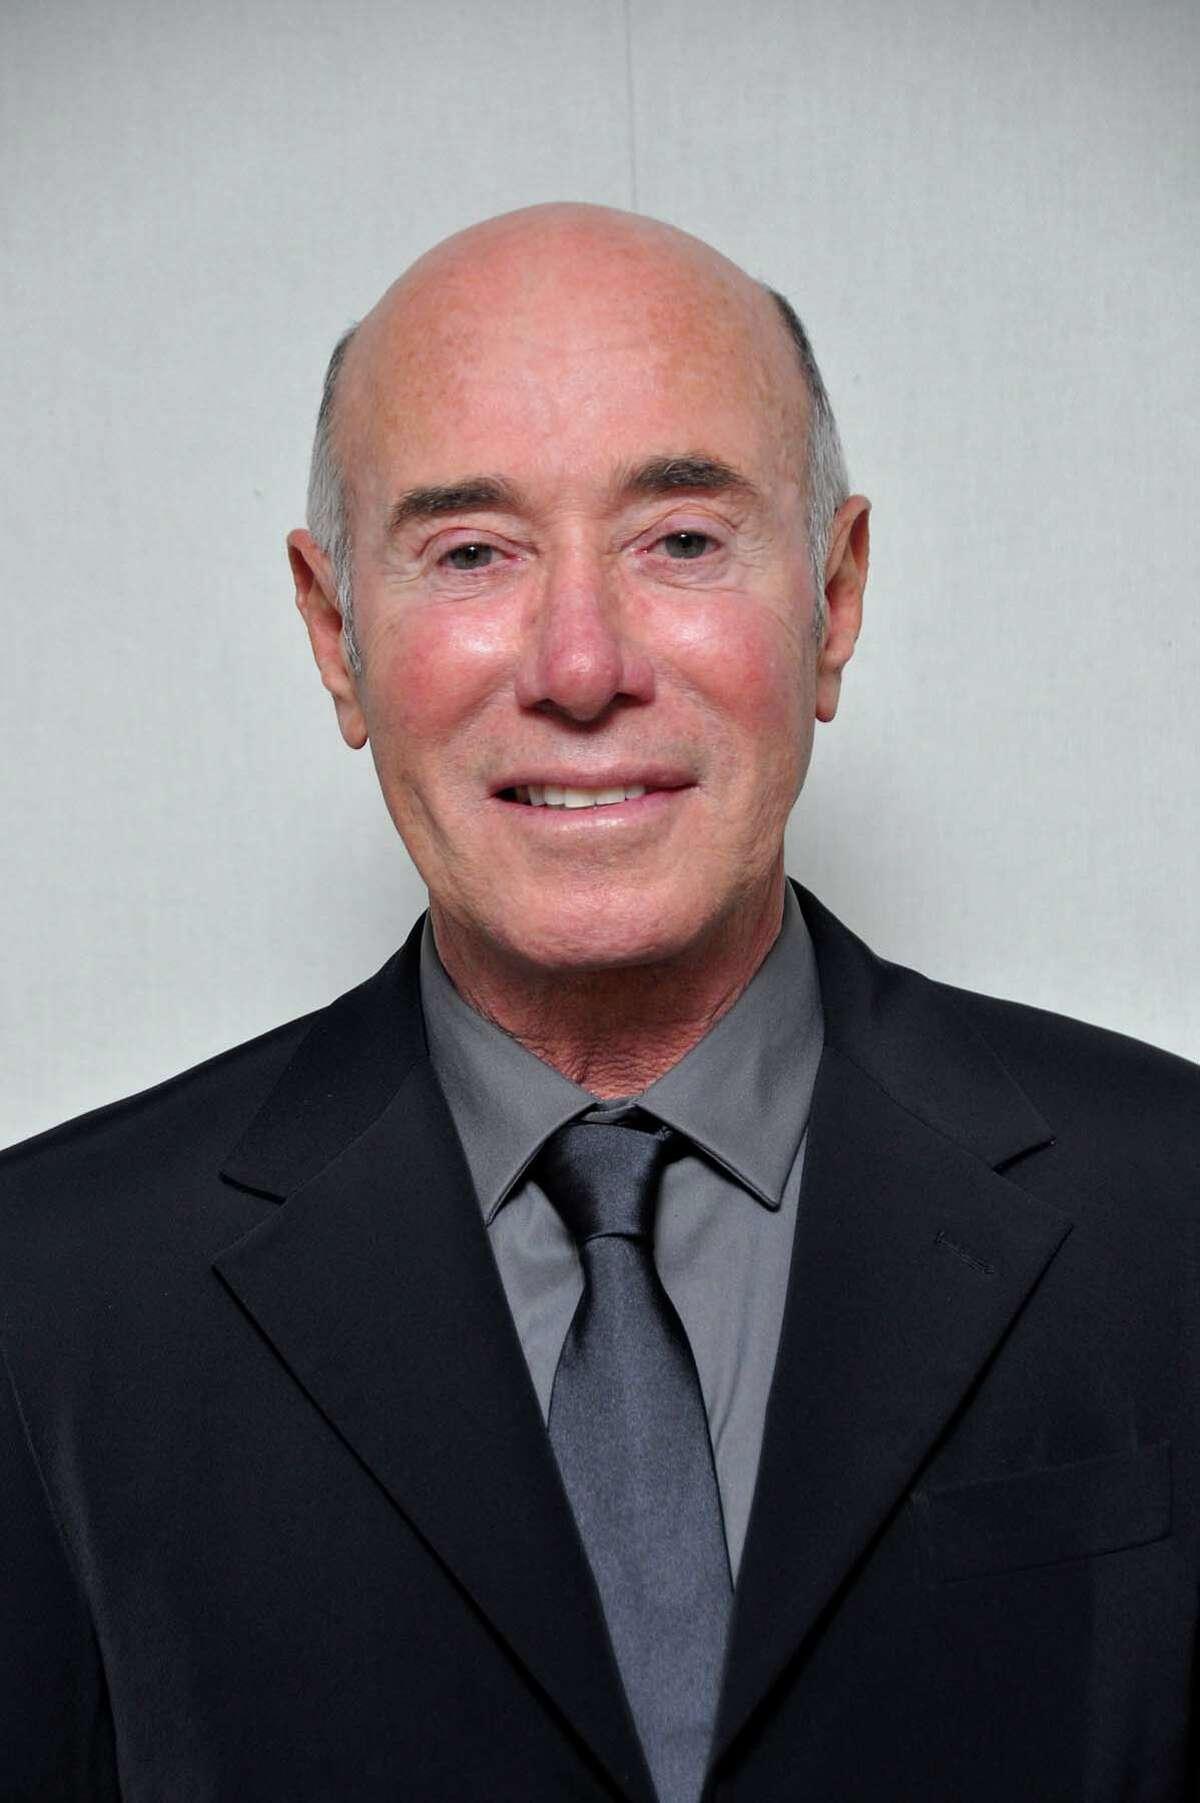 19. David Geffen, Business magnate/ Producer